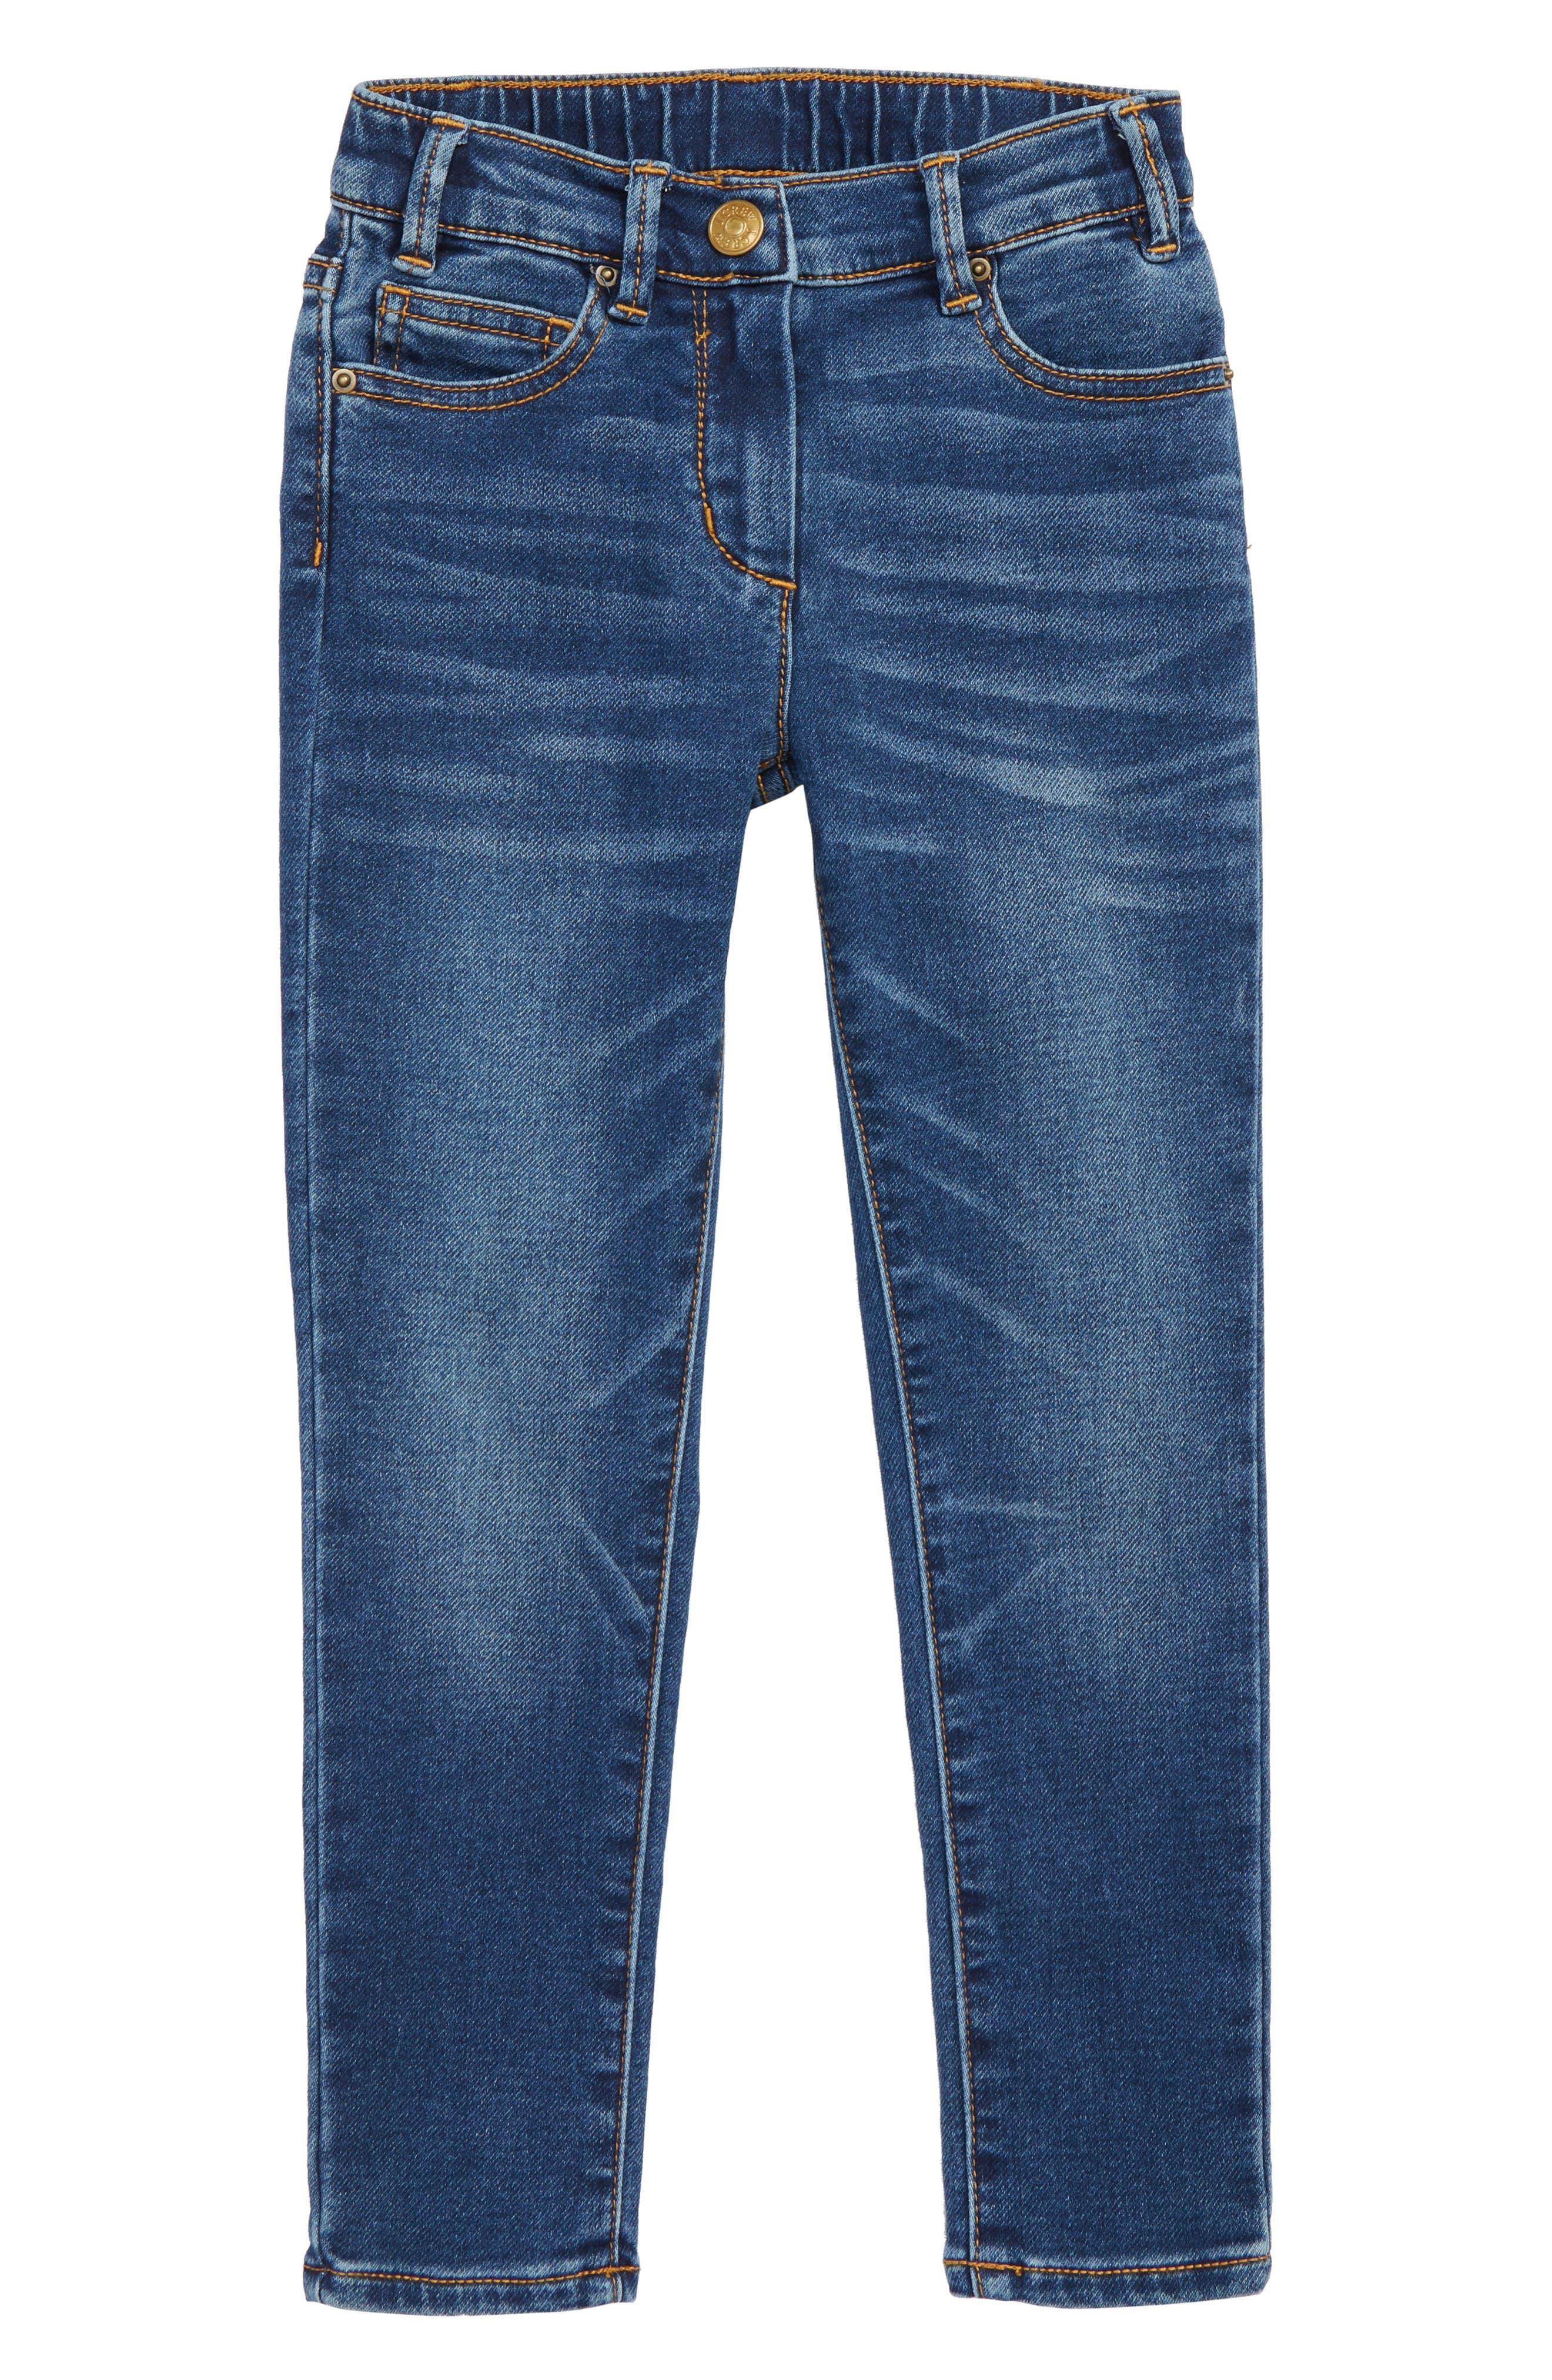 Girls Crewcuts By Jcrew Runaround Stretch Denim Jeans Size 7  Blue